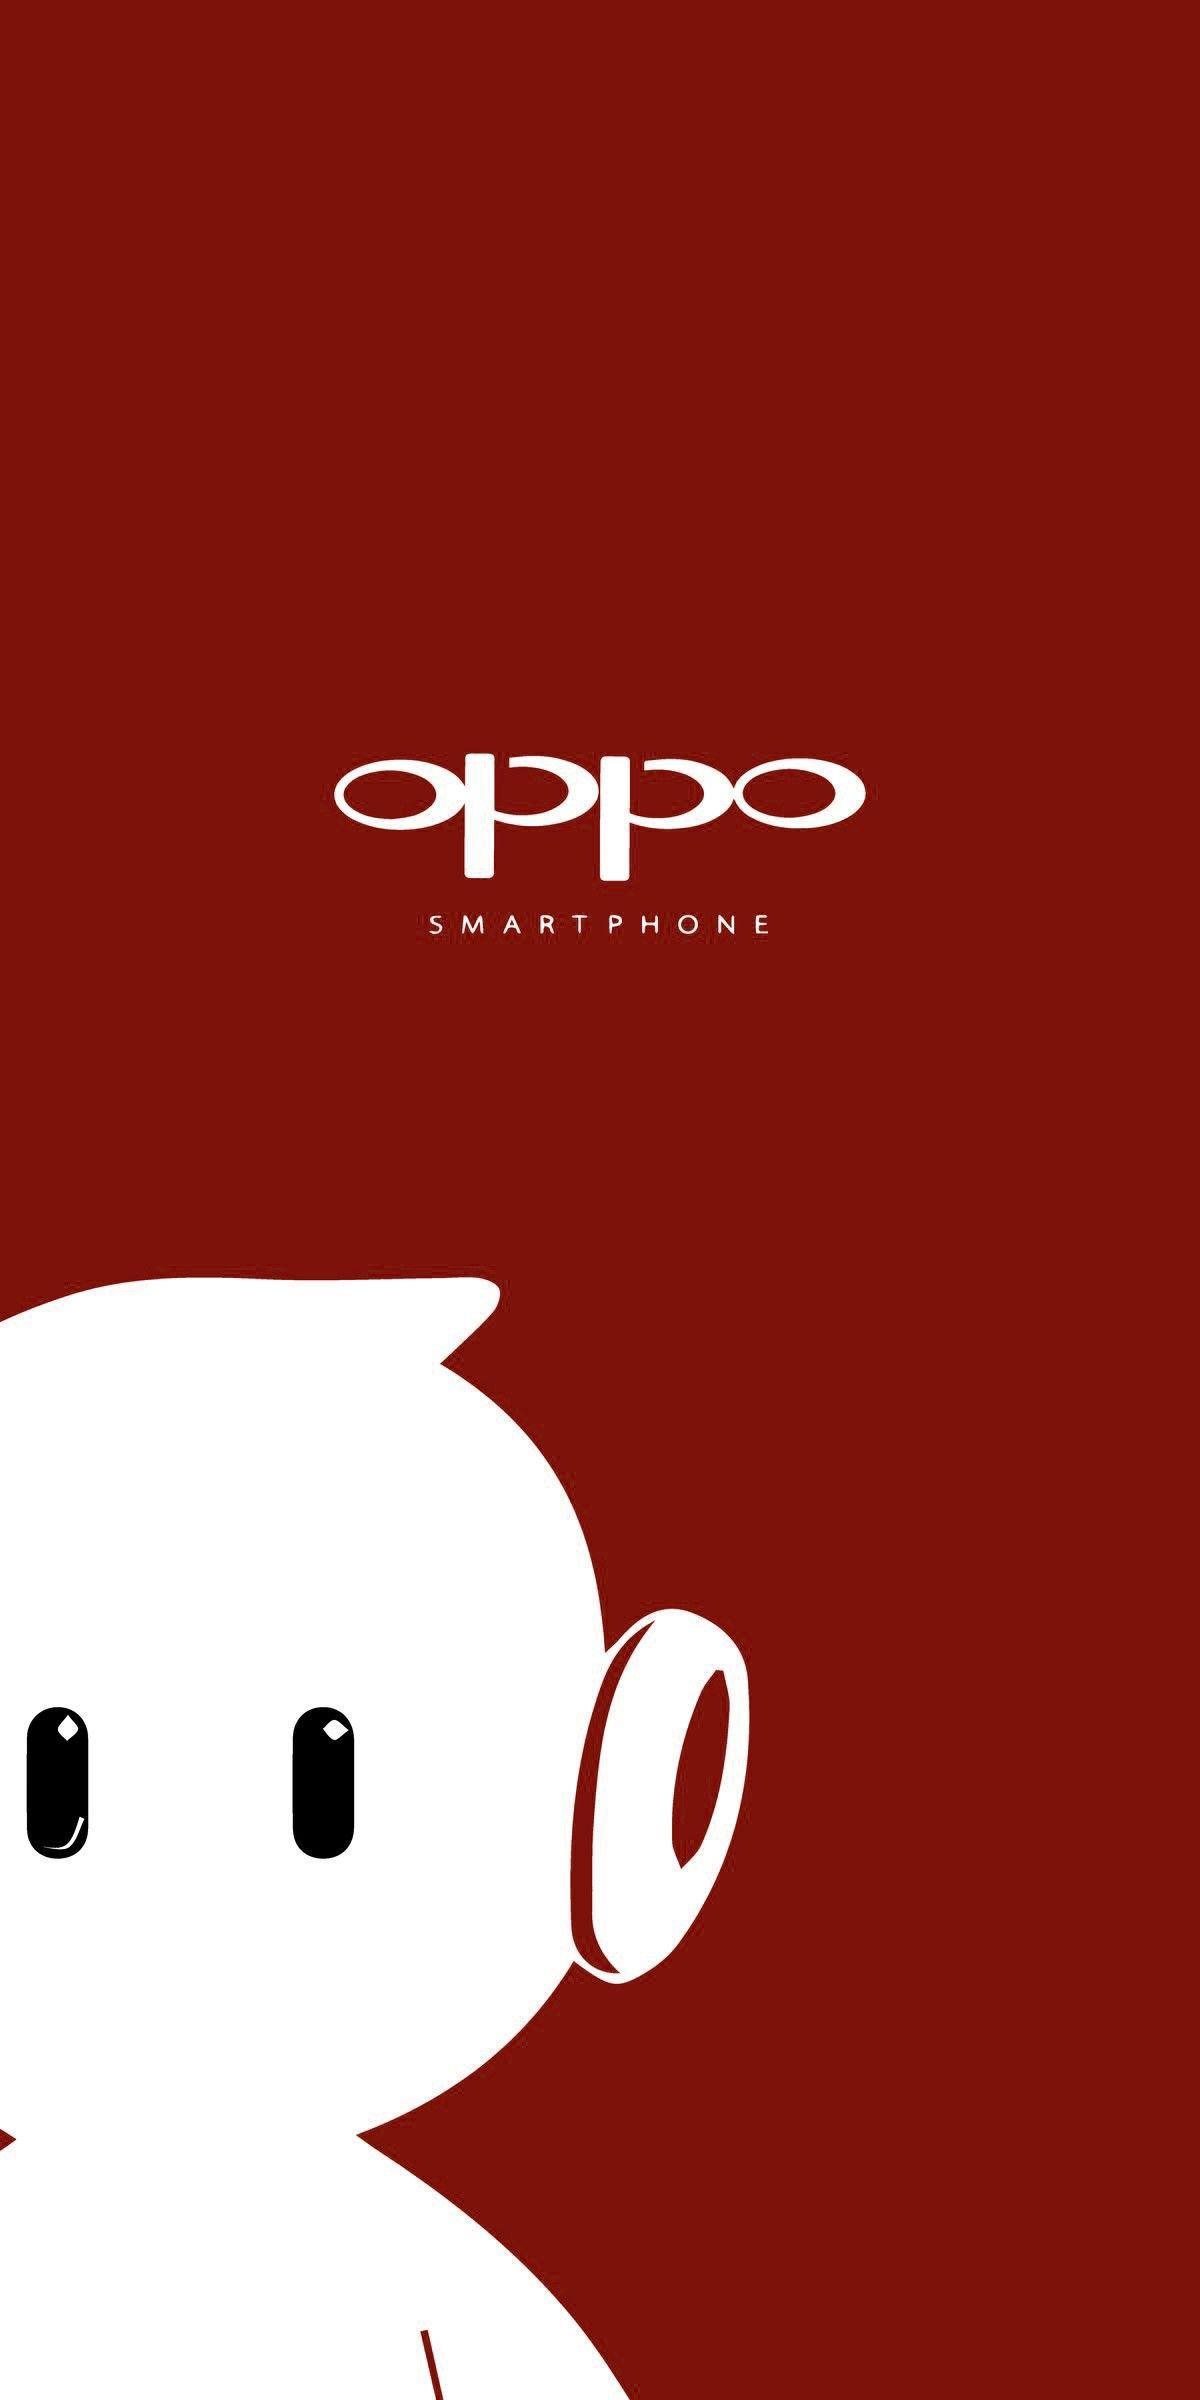 Oppo White Ollie And Red Background Seni Wallpaper Ponsel Gambar